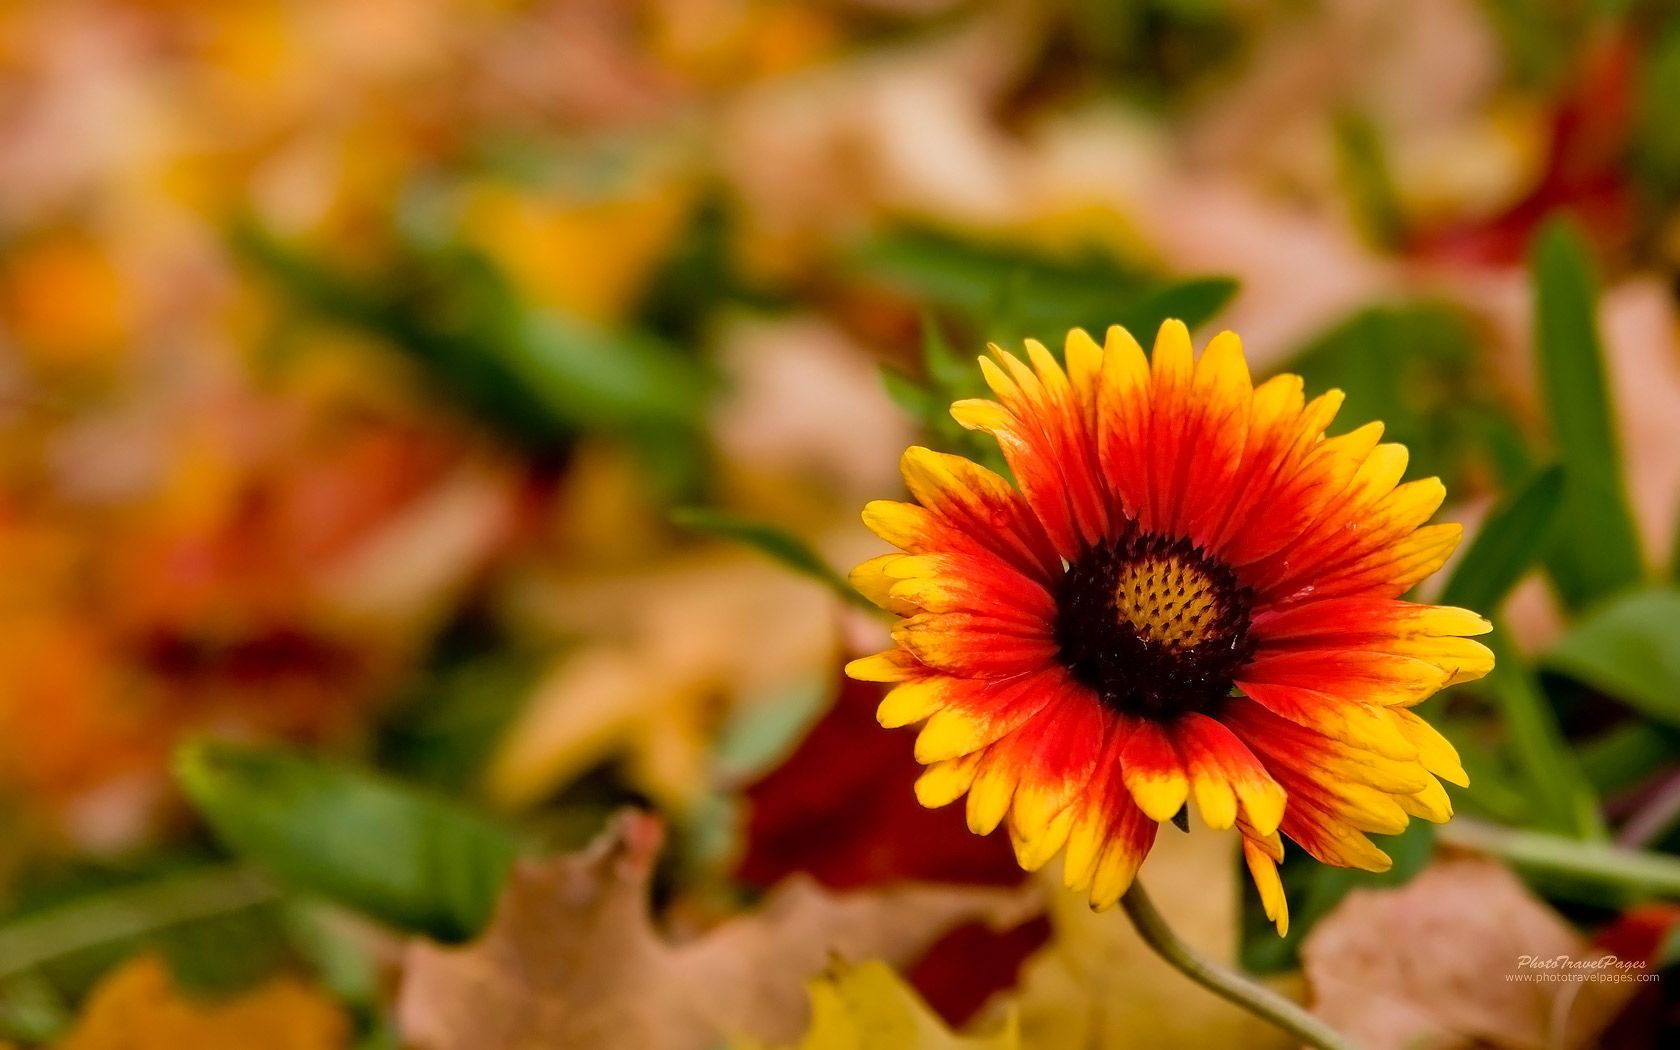 autumn flowers wallpaper hd | autumn | pinterest | autumn flowers